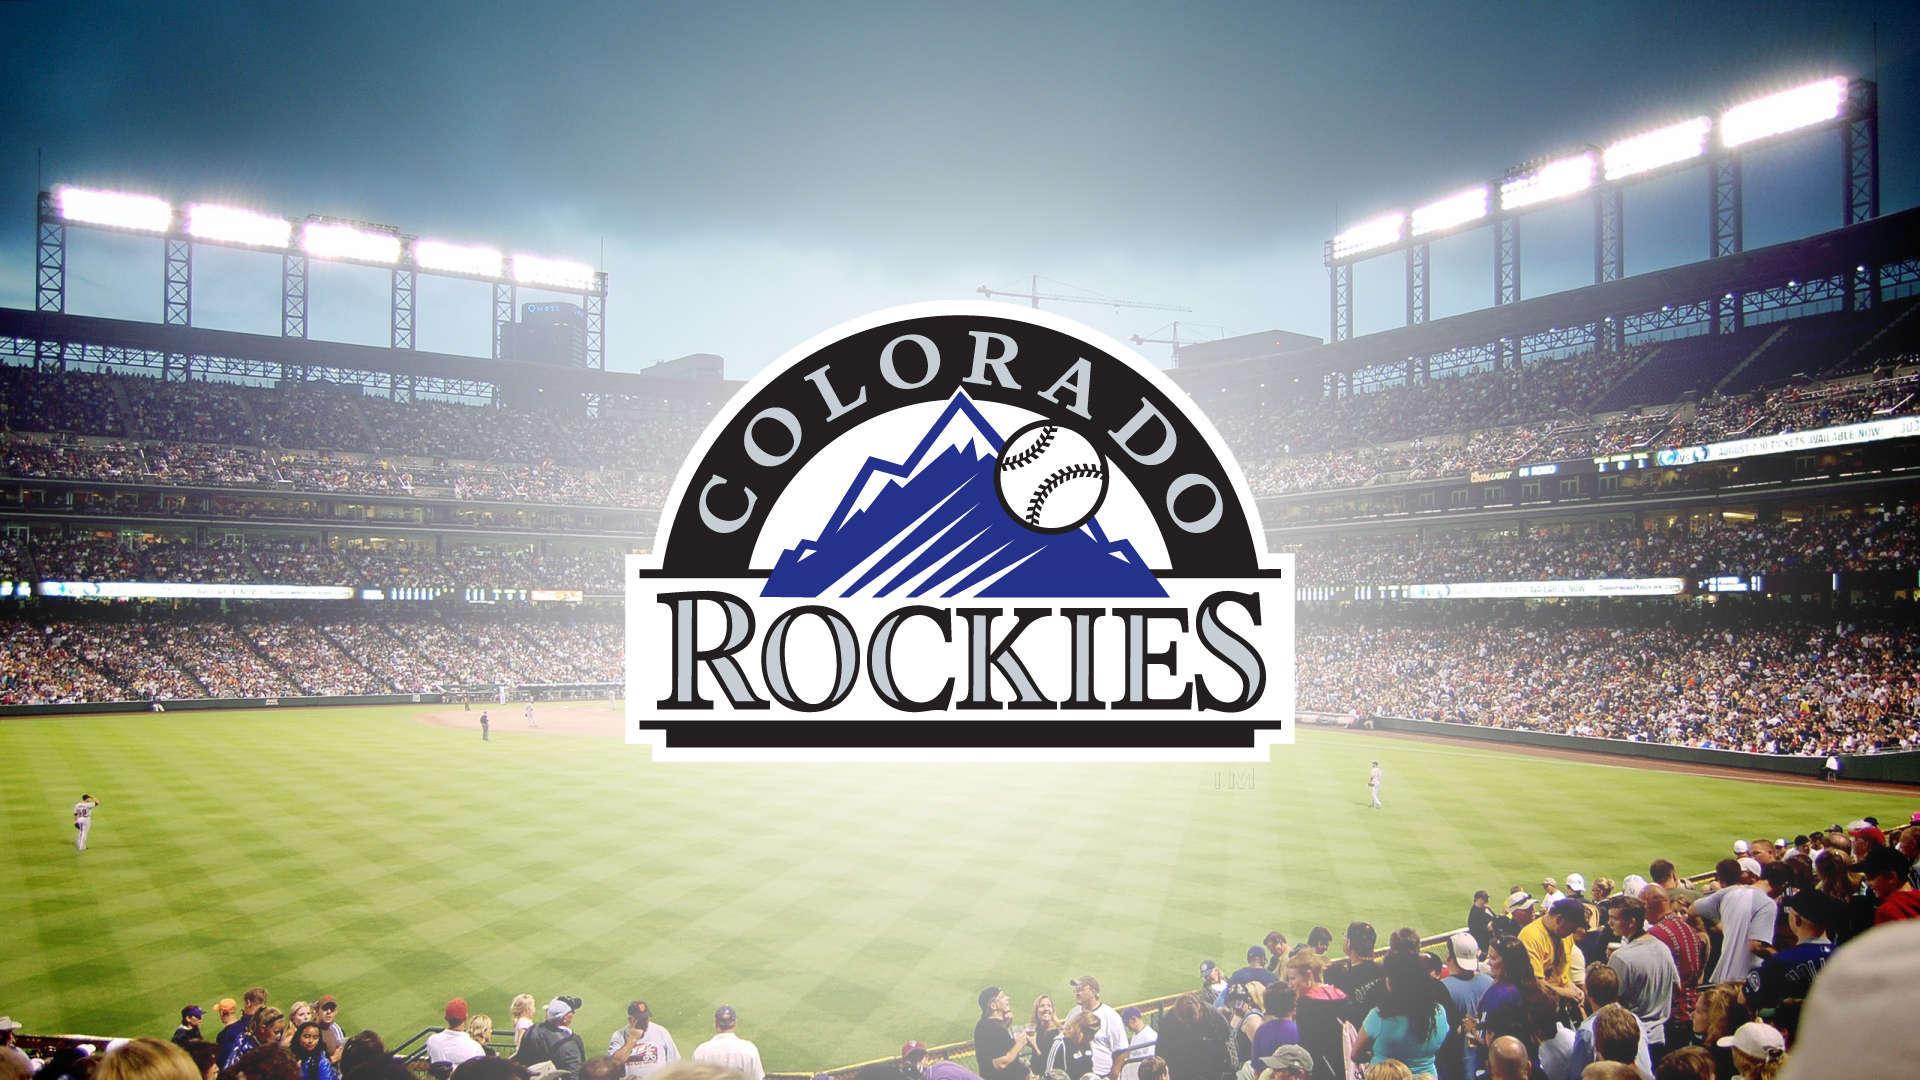 Wallpaper Colorado Rockies Logo Stadium HD Wallpaper Upload at April 1920x1080